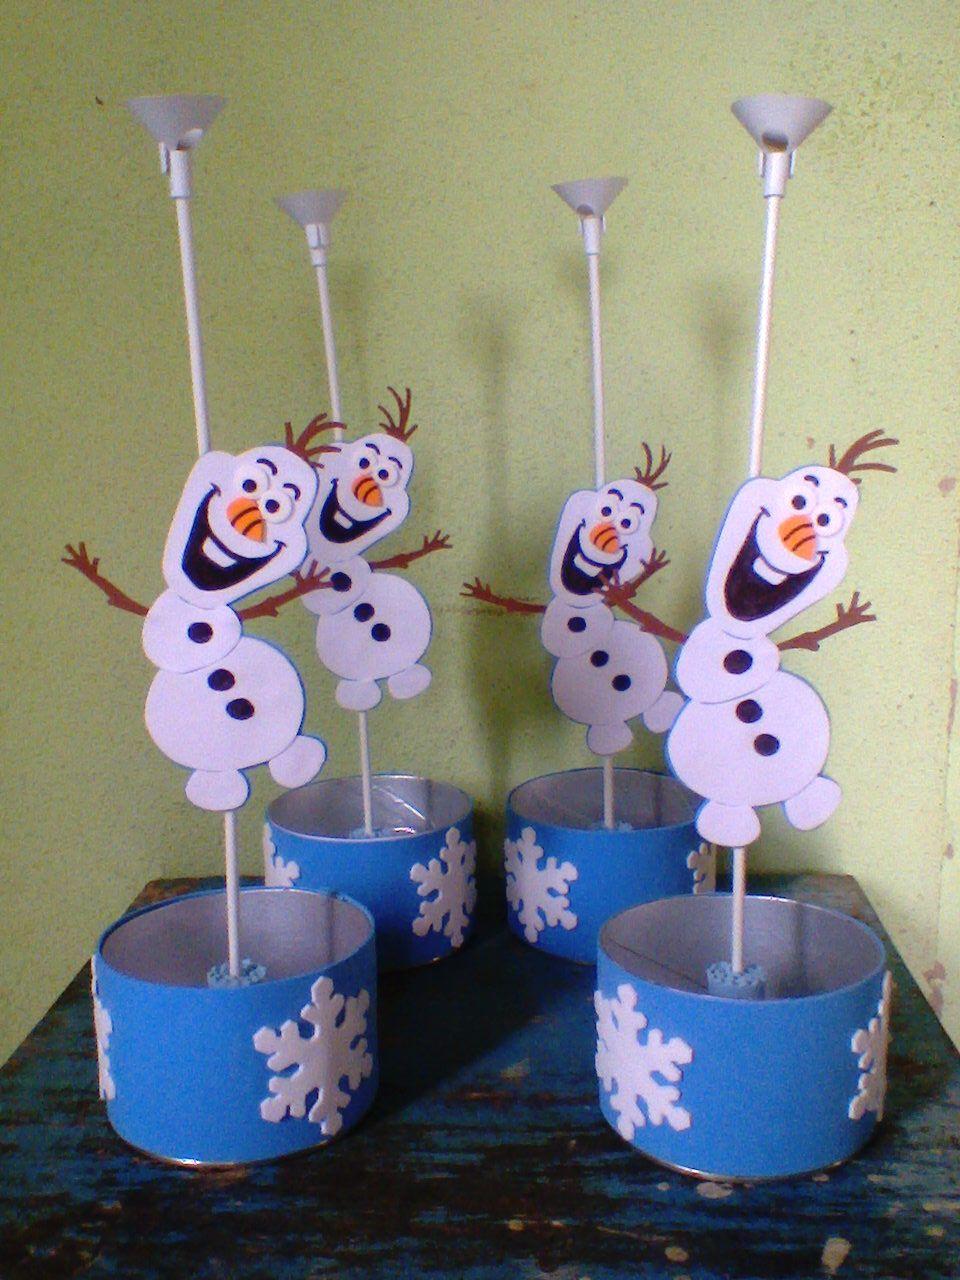 Frozen centros de mesa images - Centros d mesa ...